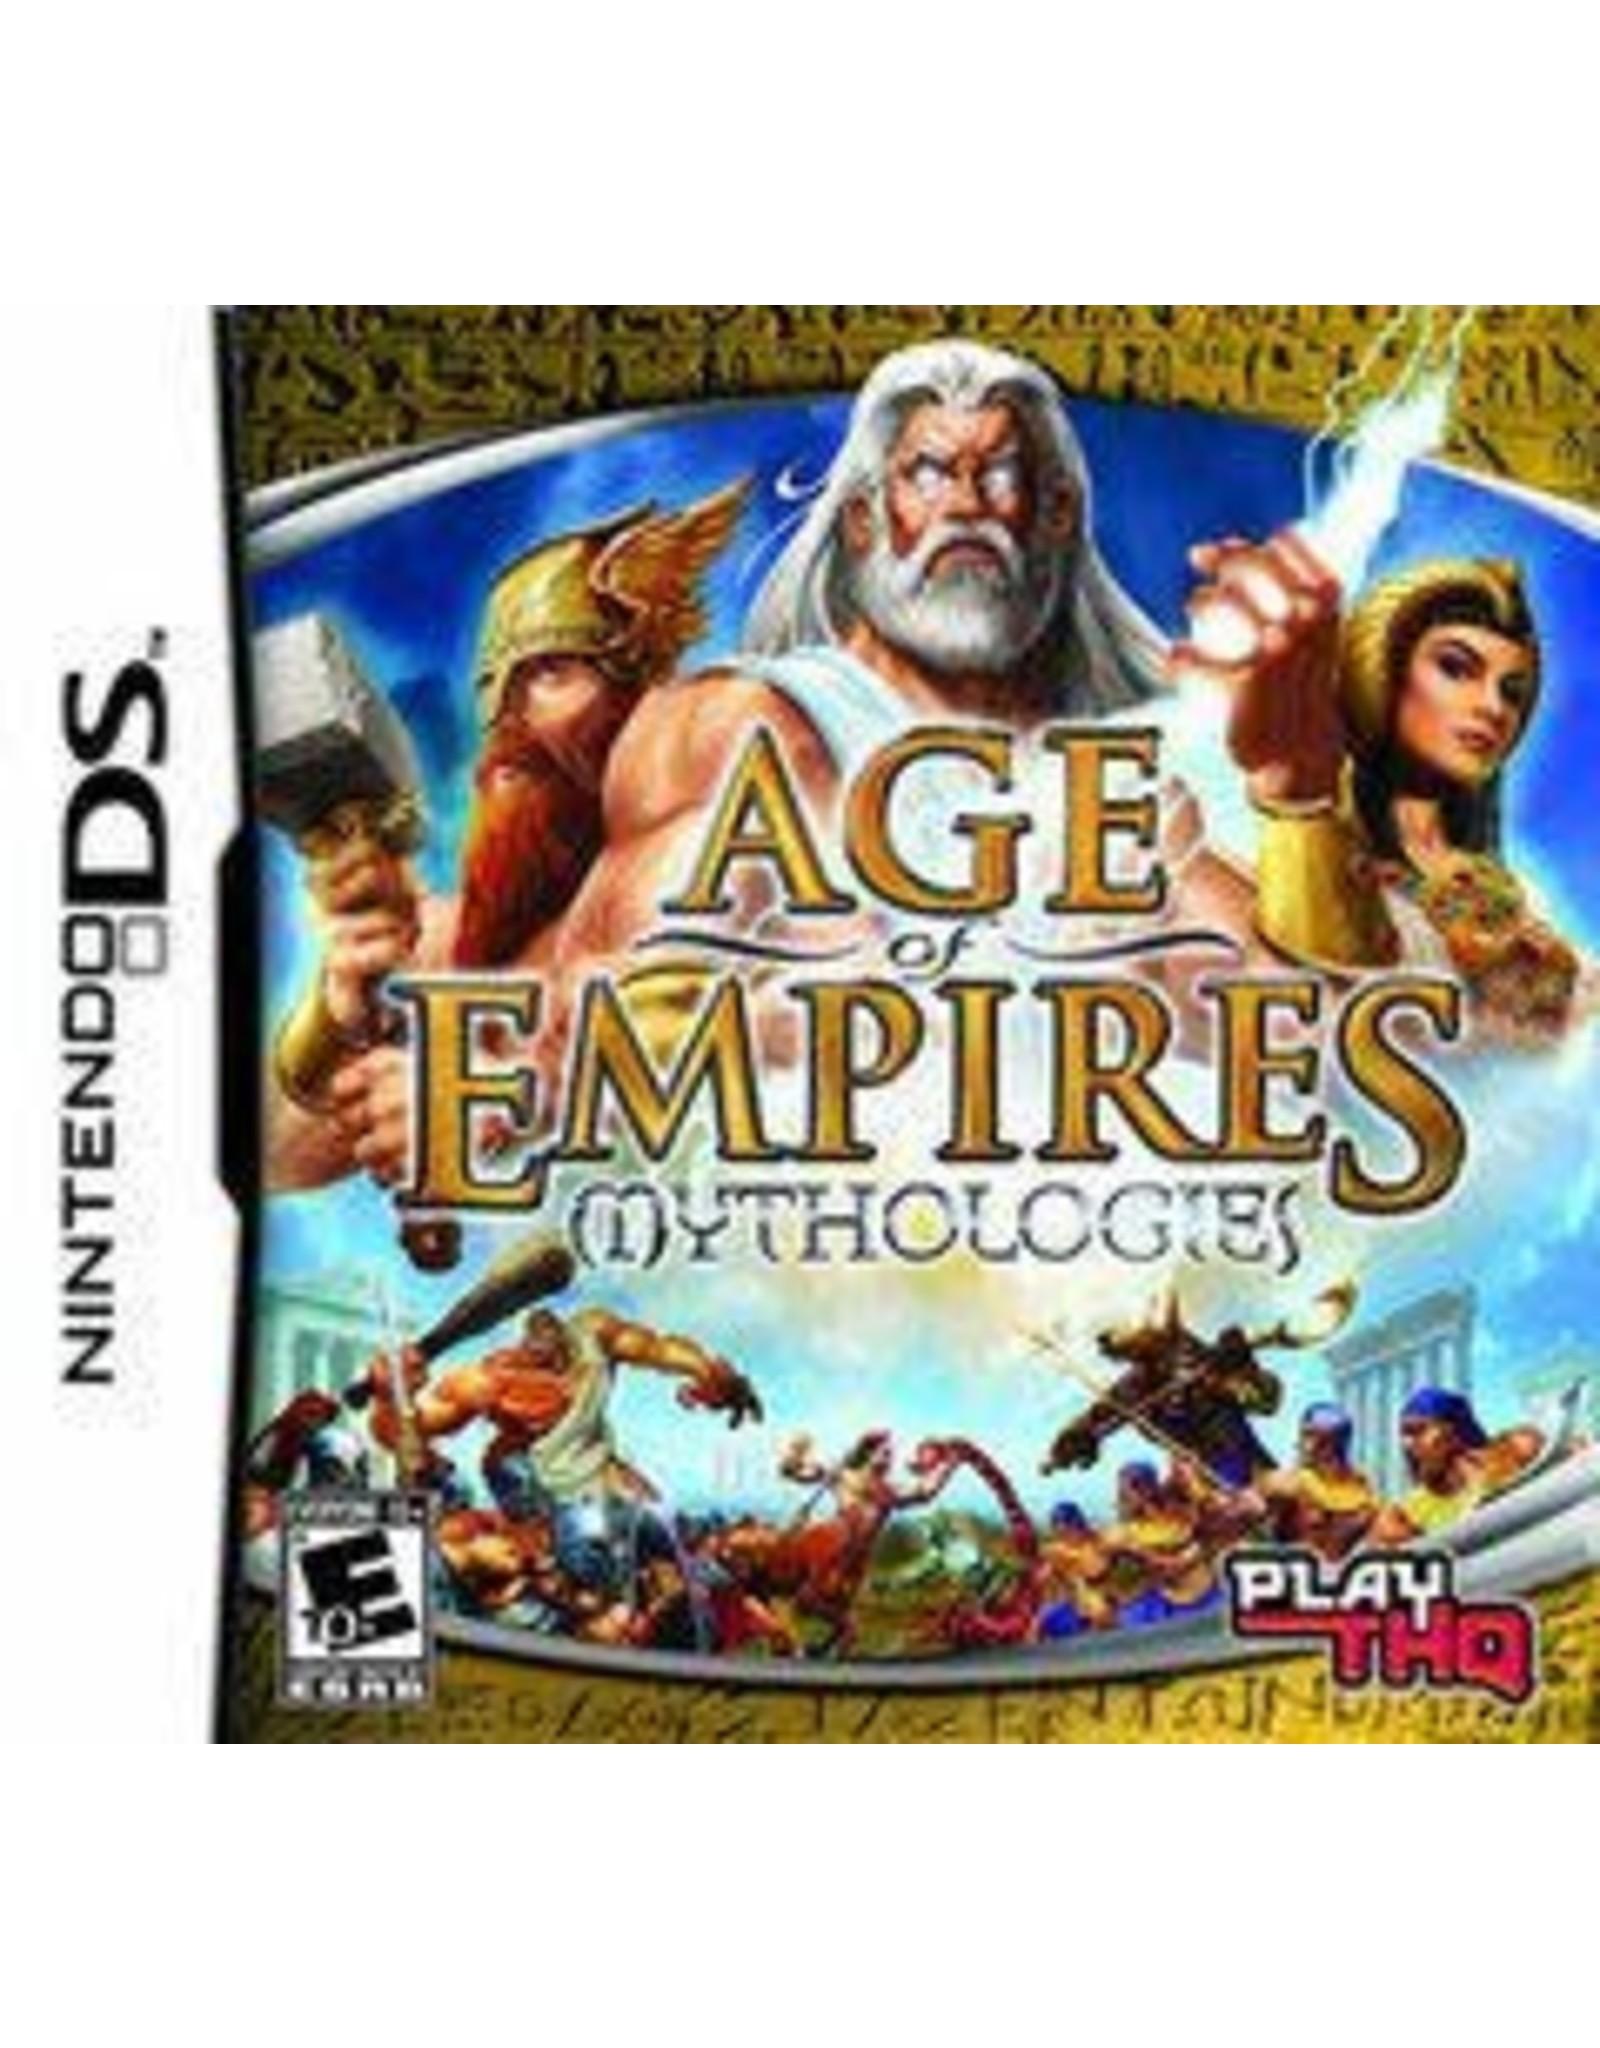 Nintendo DS Age of Empires Mythologies (CiB)